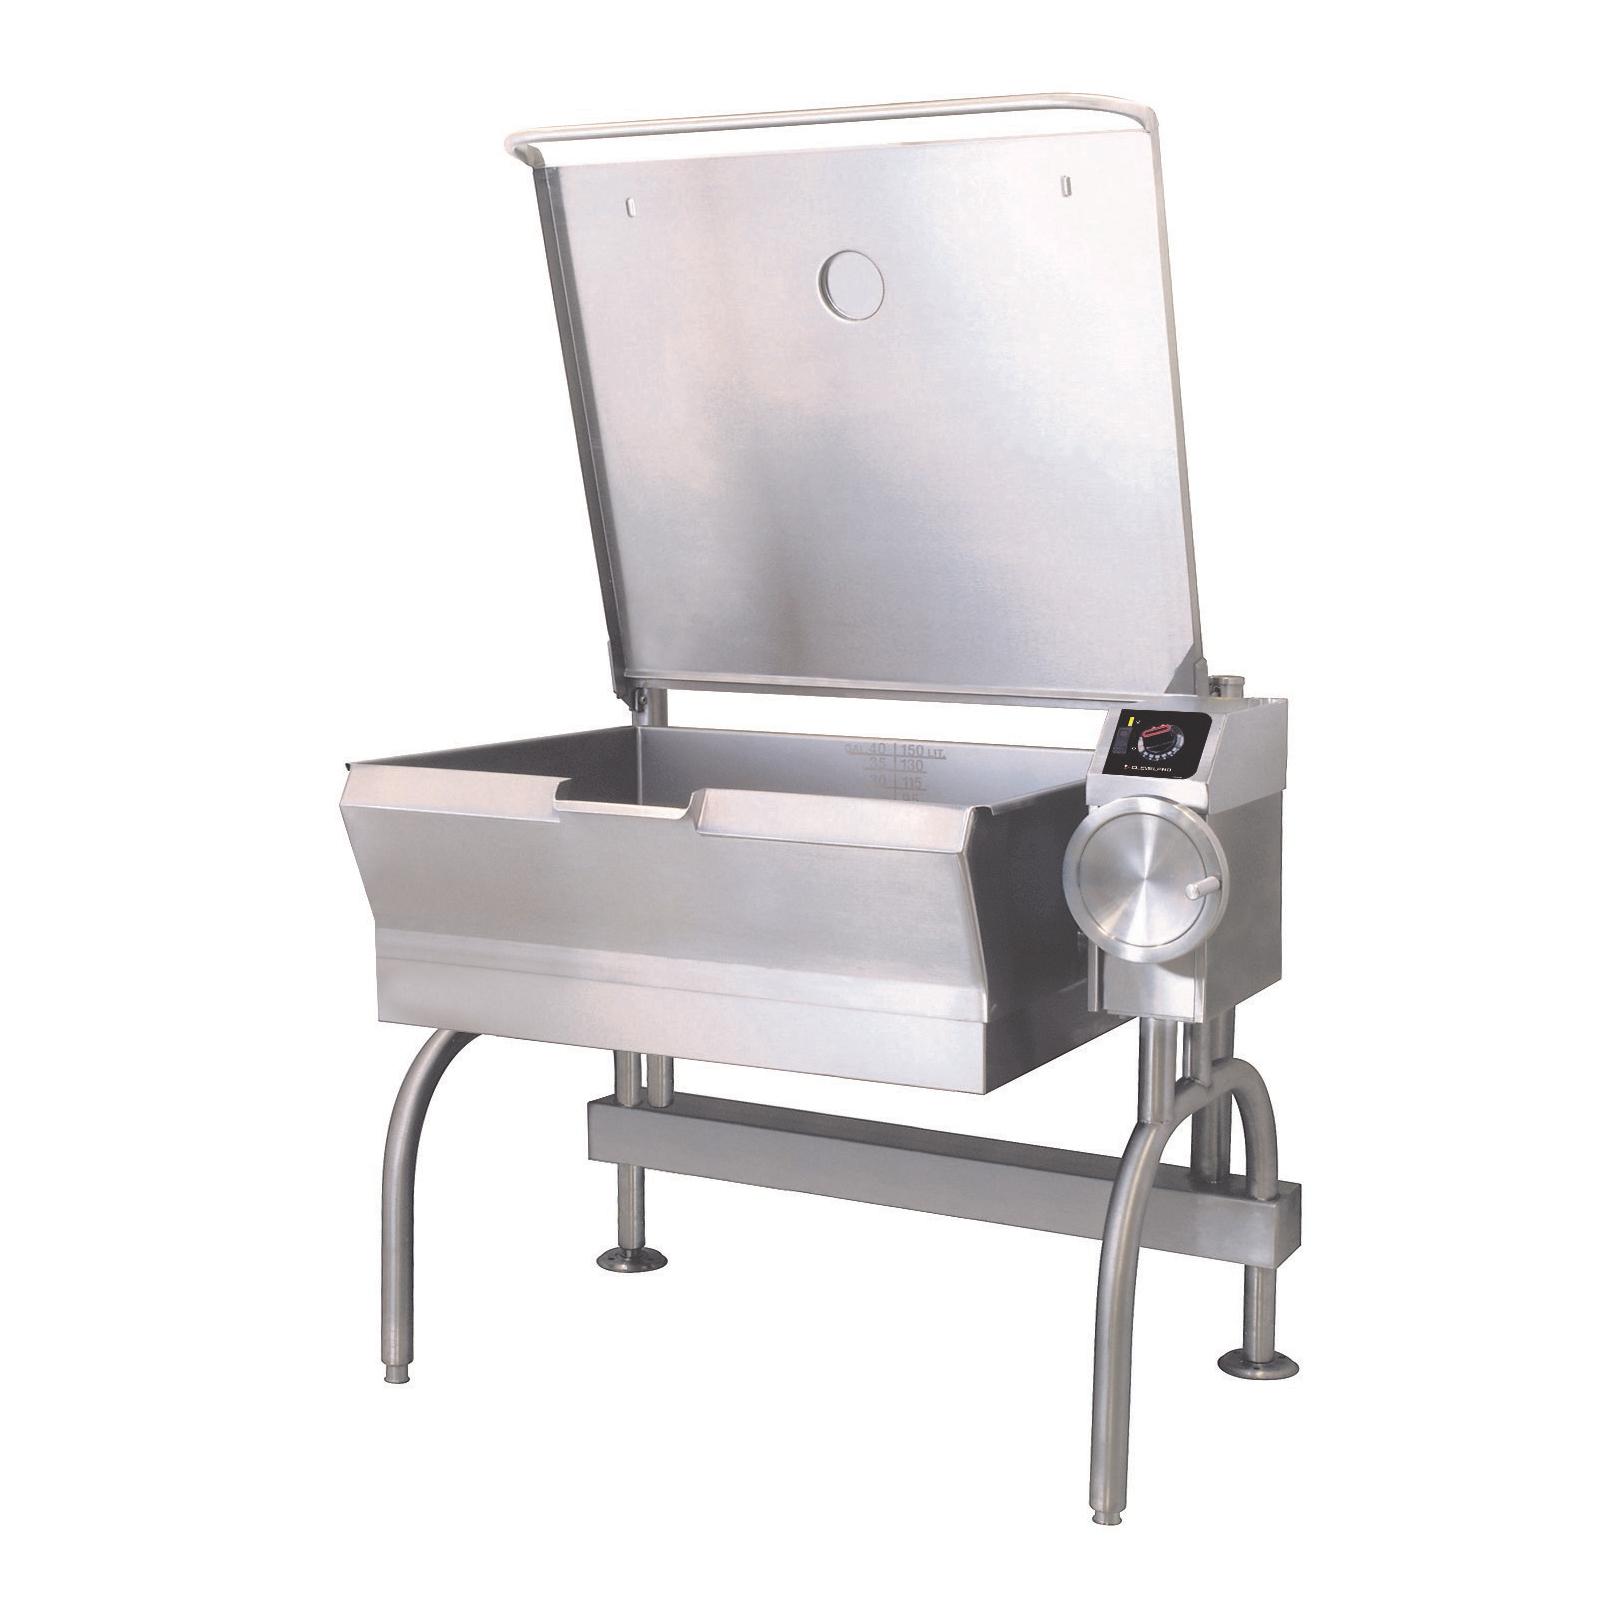 Cleveland Range SEL30T1 tilting skillet braising pan, electric